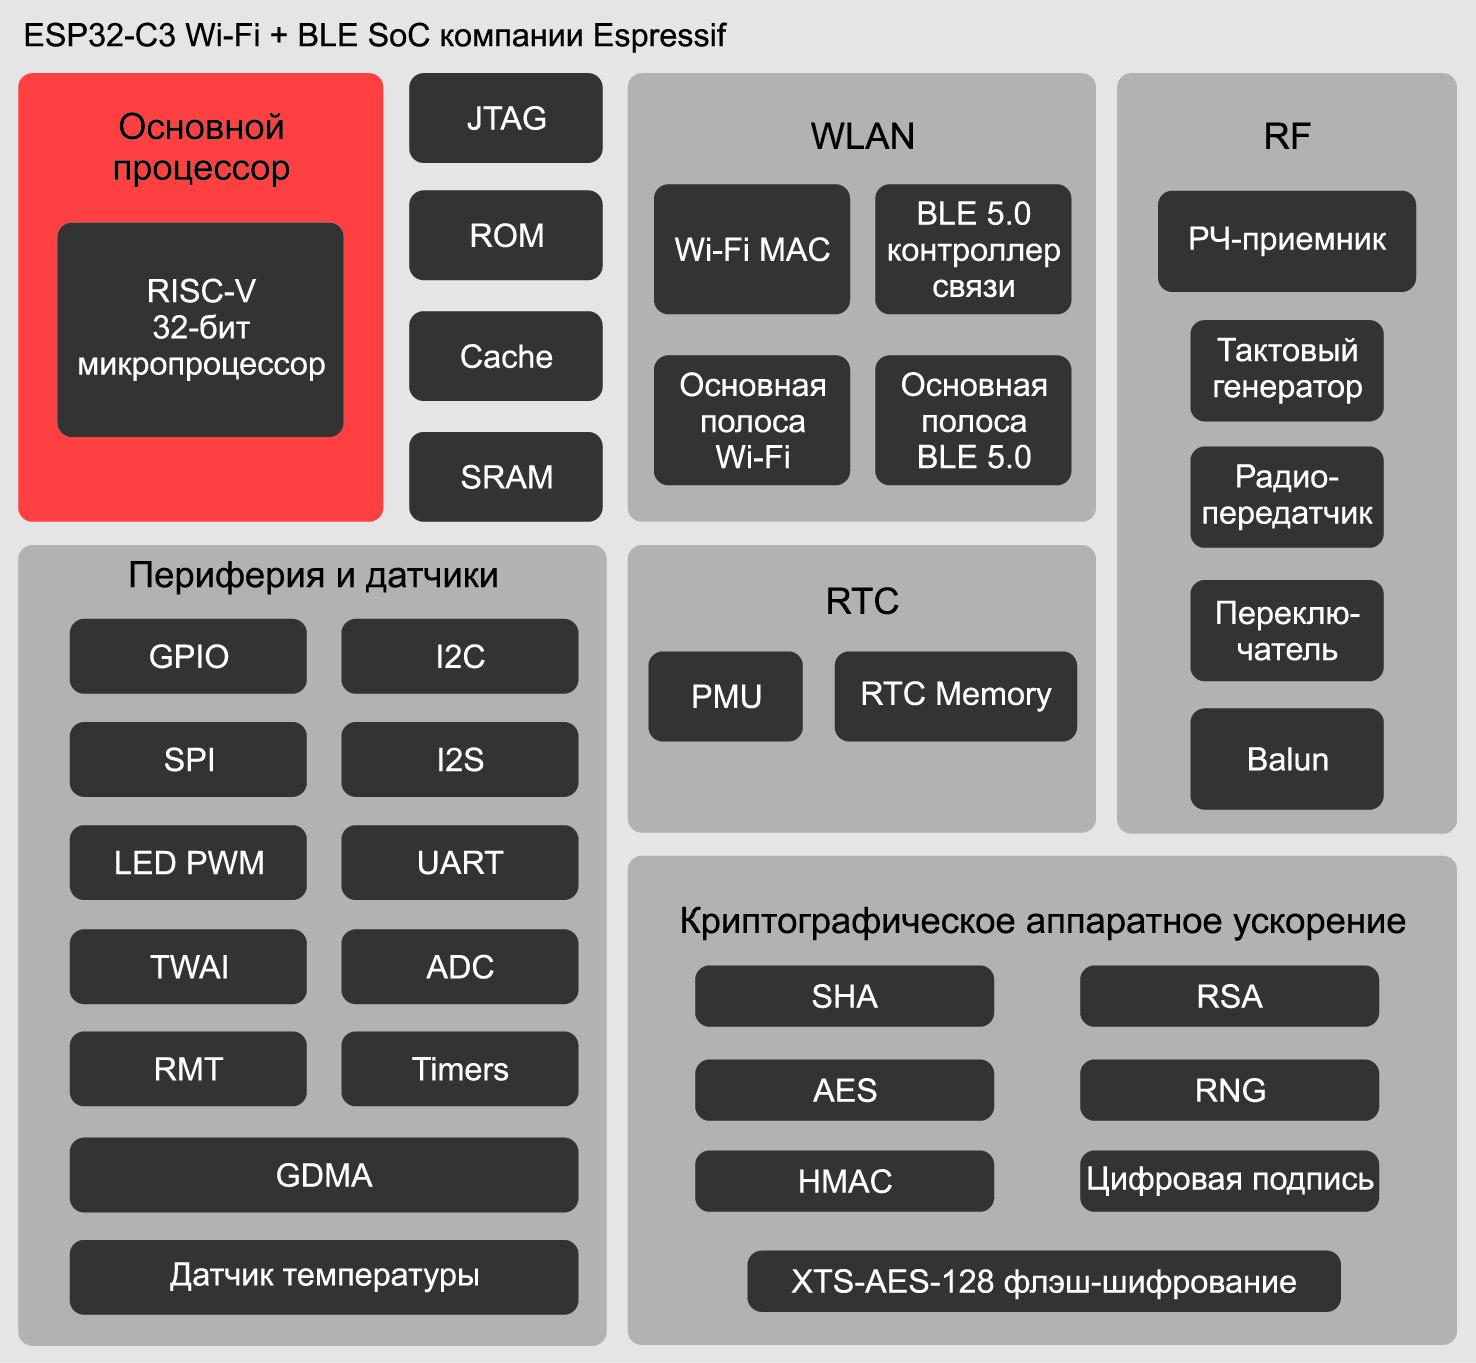 Блок-схема SoC-модуля ESP32-C3